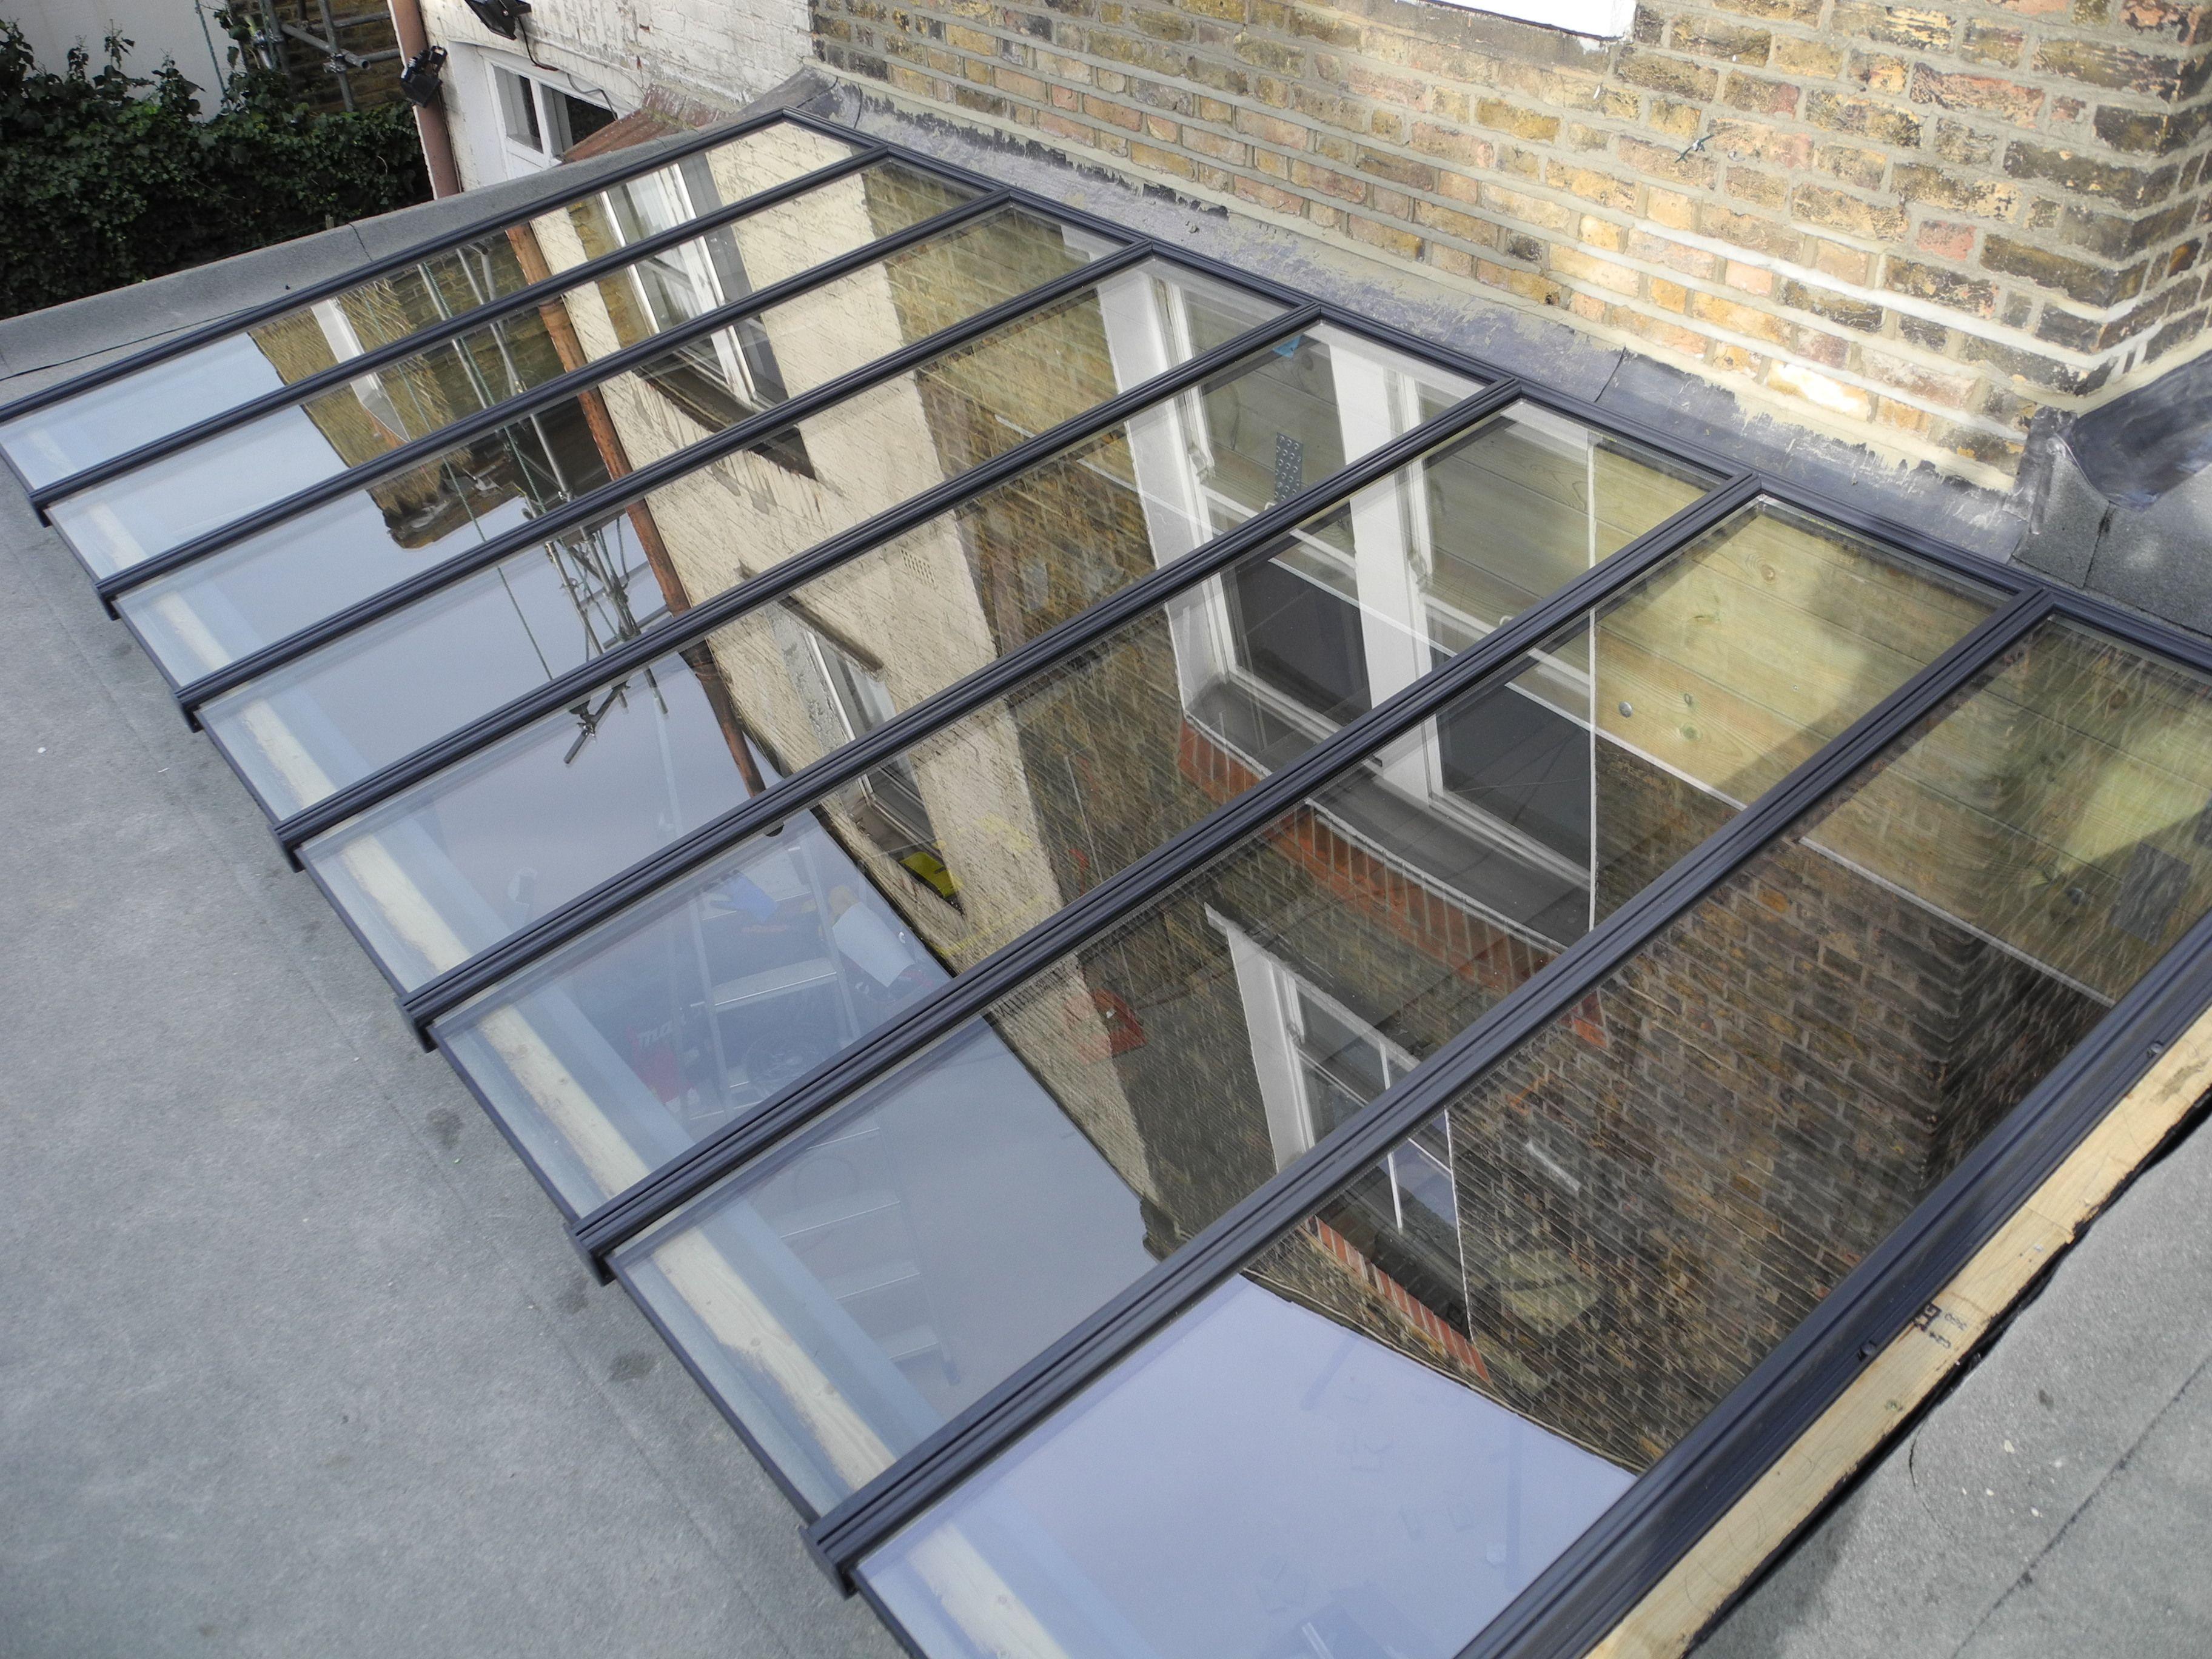 toit vitr maison londres pinterest terrasse. Black Bedroom Furniture Sets. Home Design Ideas